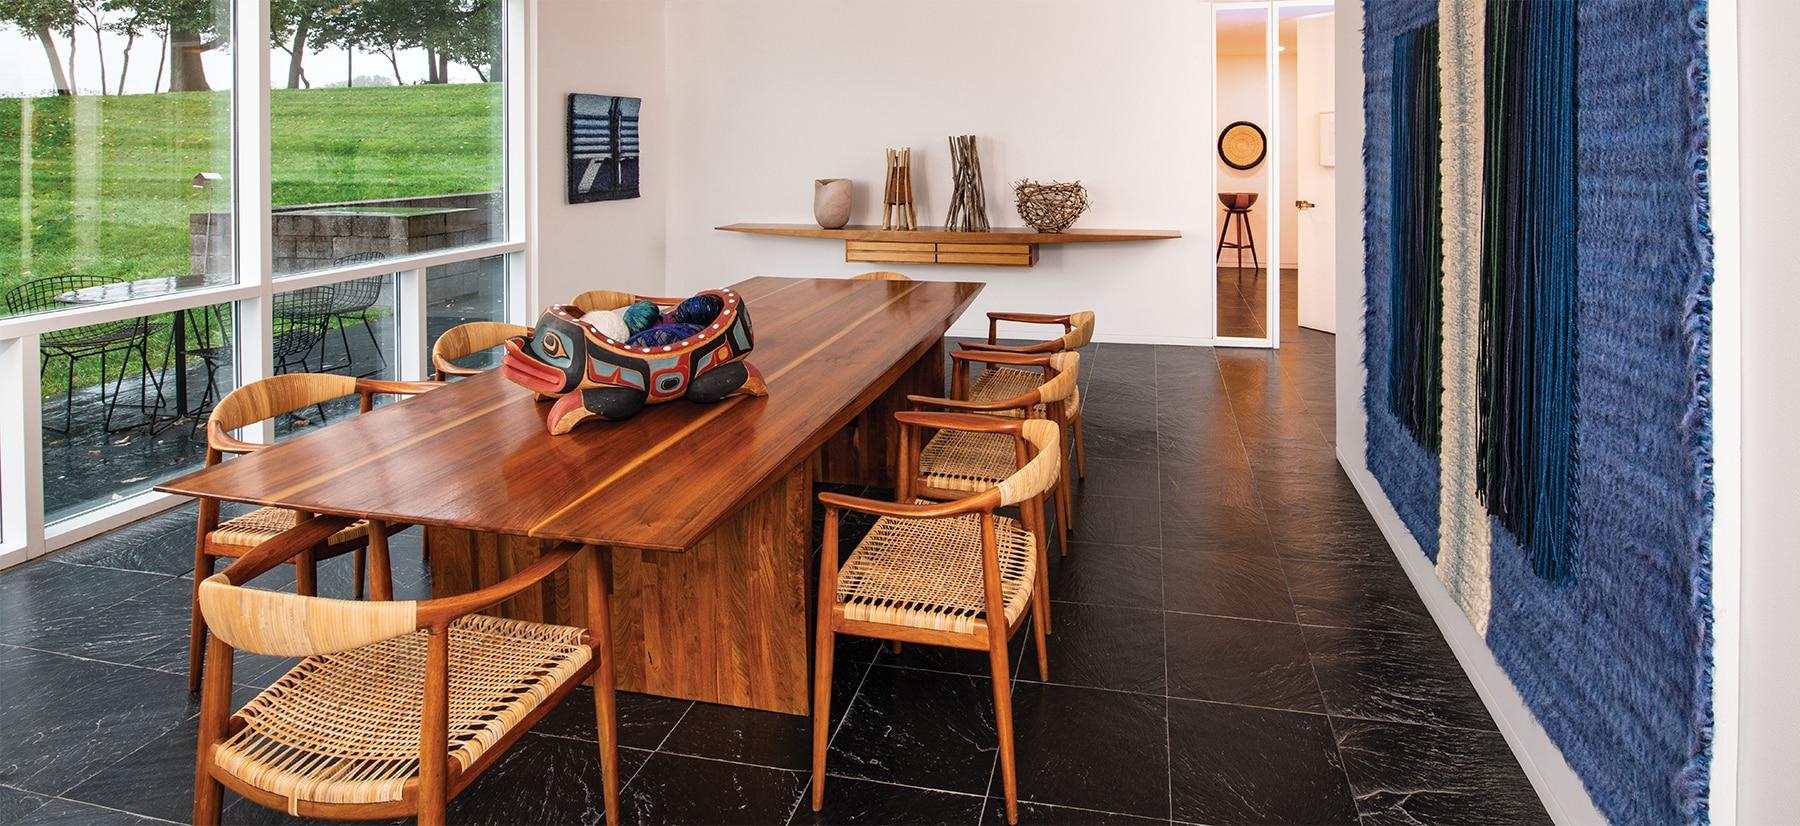 Louis and Sandy Grotta Richard Meier house dining room